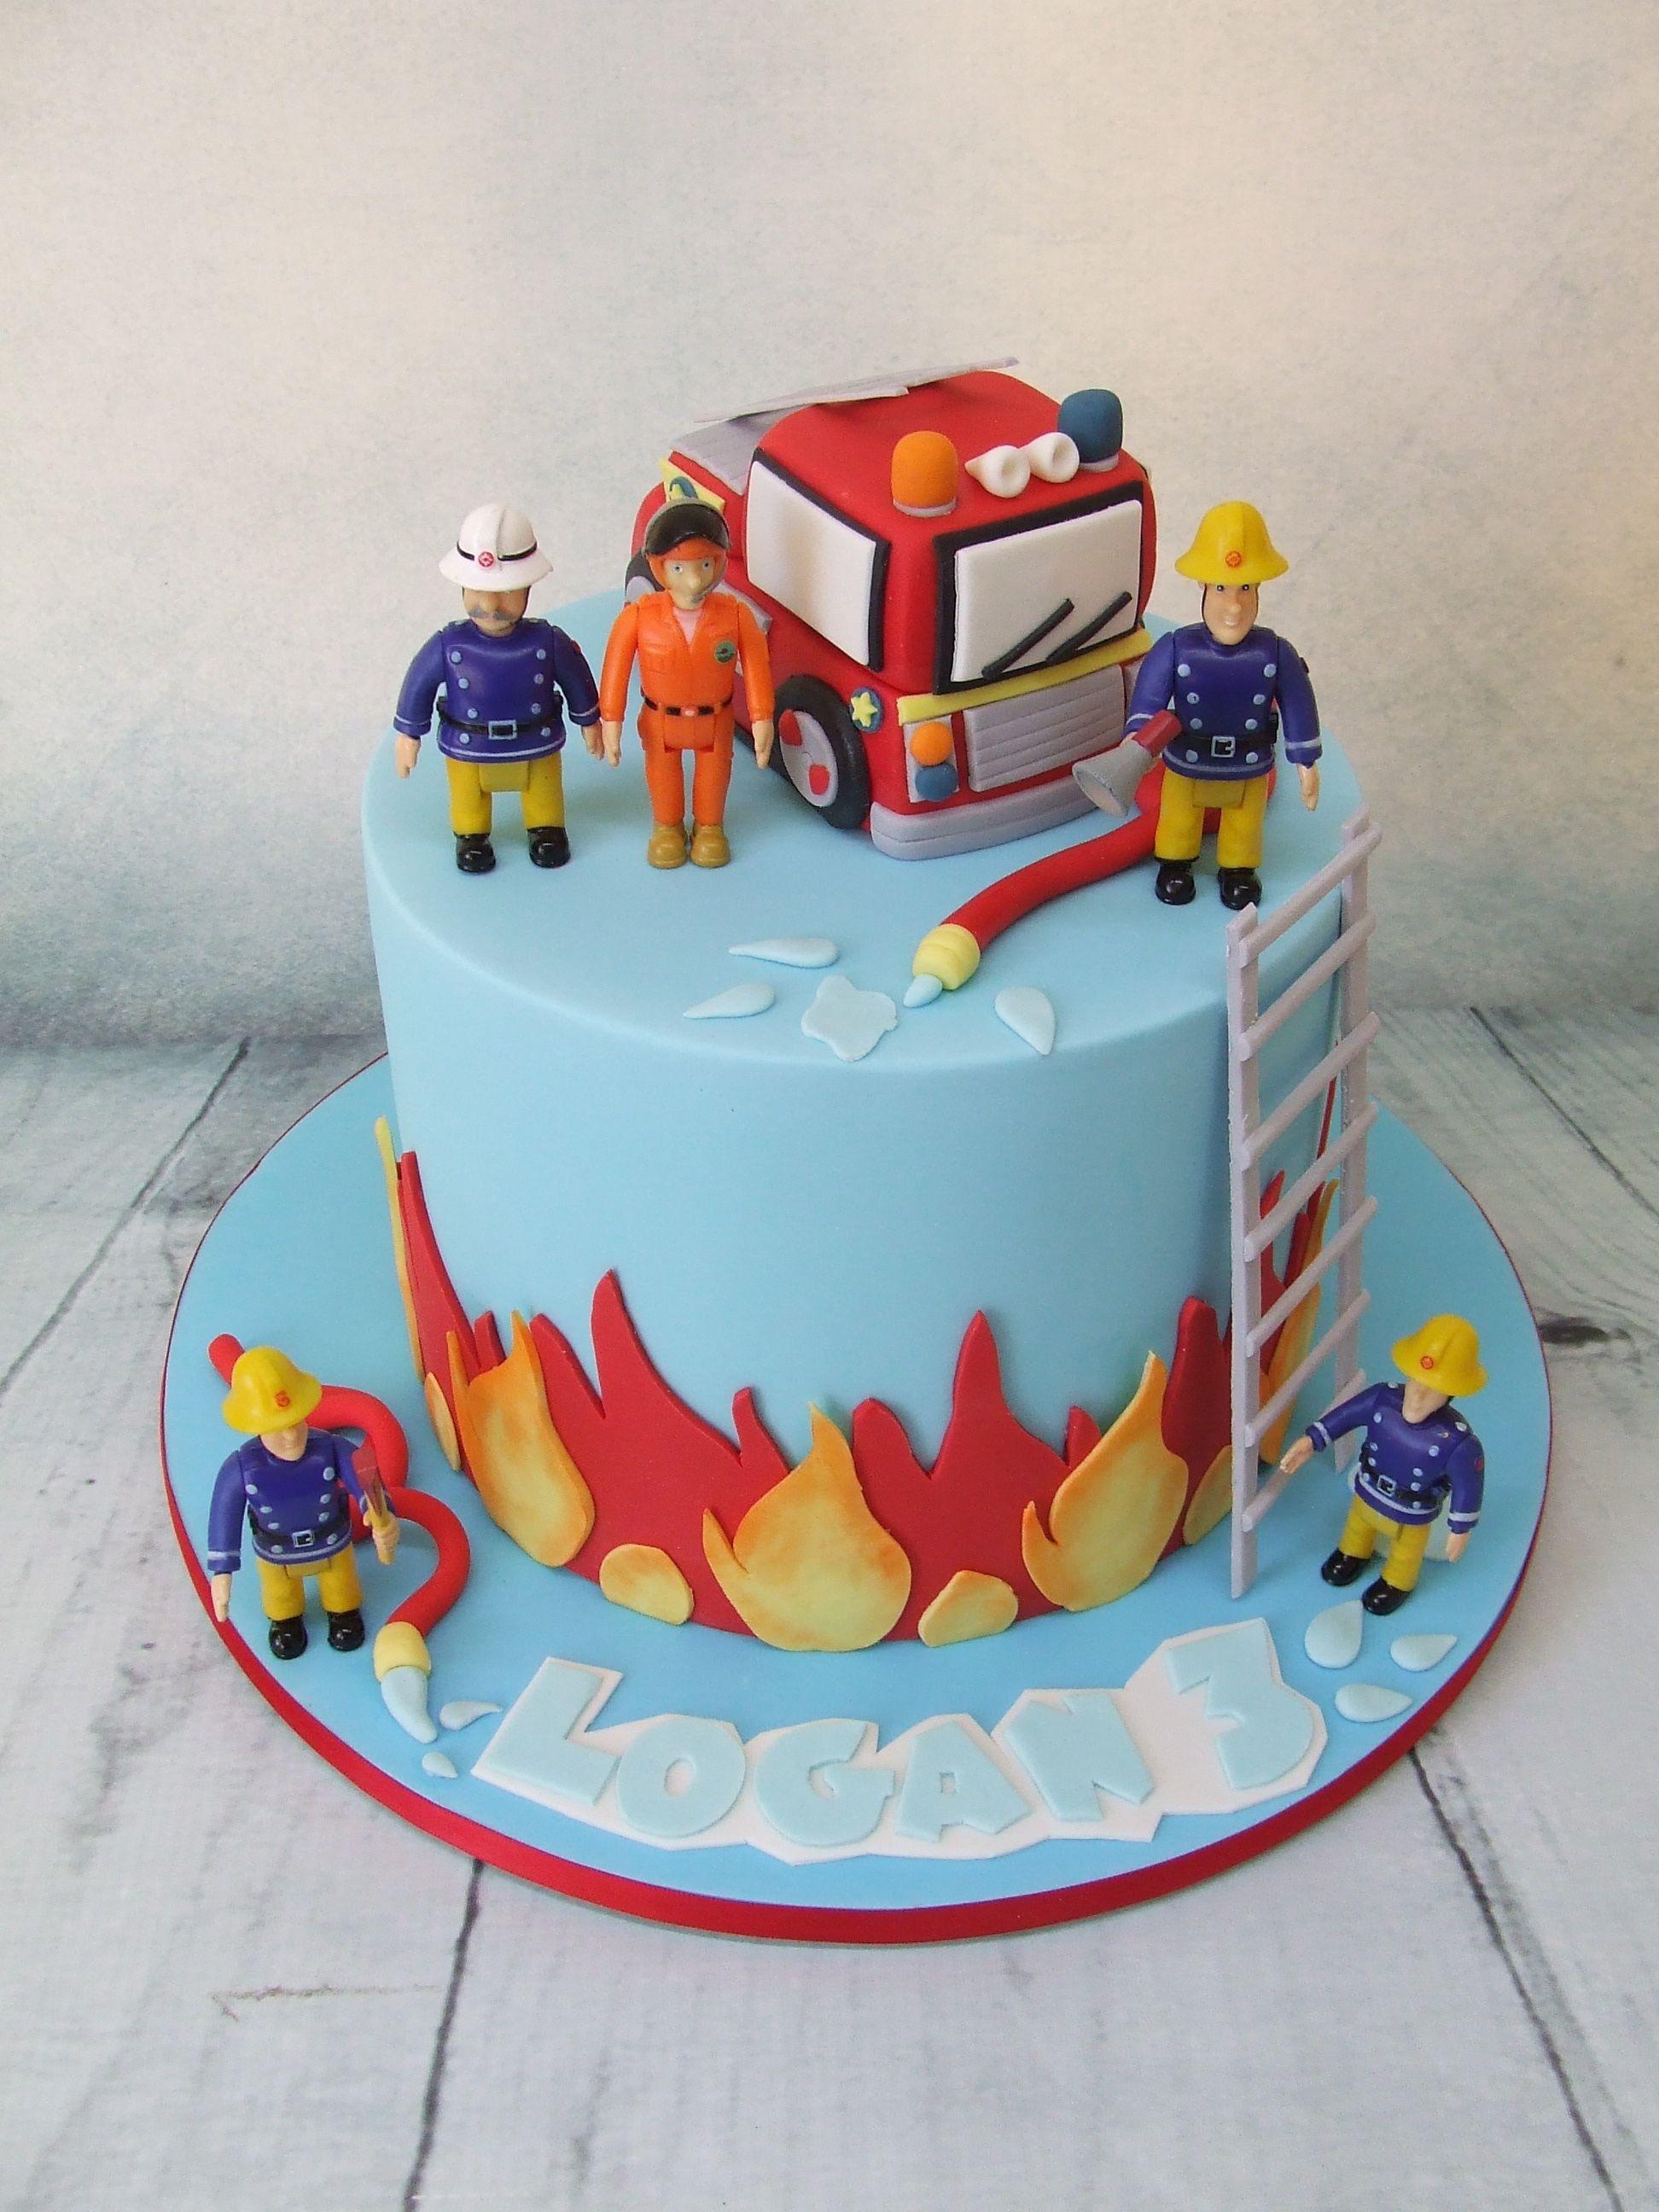 Fabulous 21 Wonderful Image Of Fireman Birthday Cake With Images Funny Birthday Cards Online Elaedamsfinfo